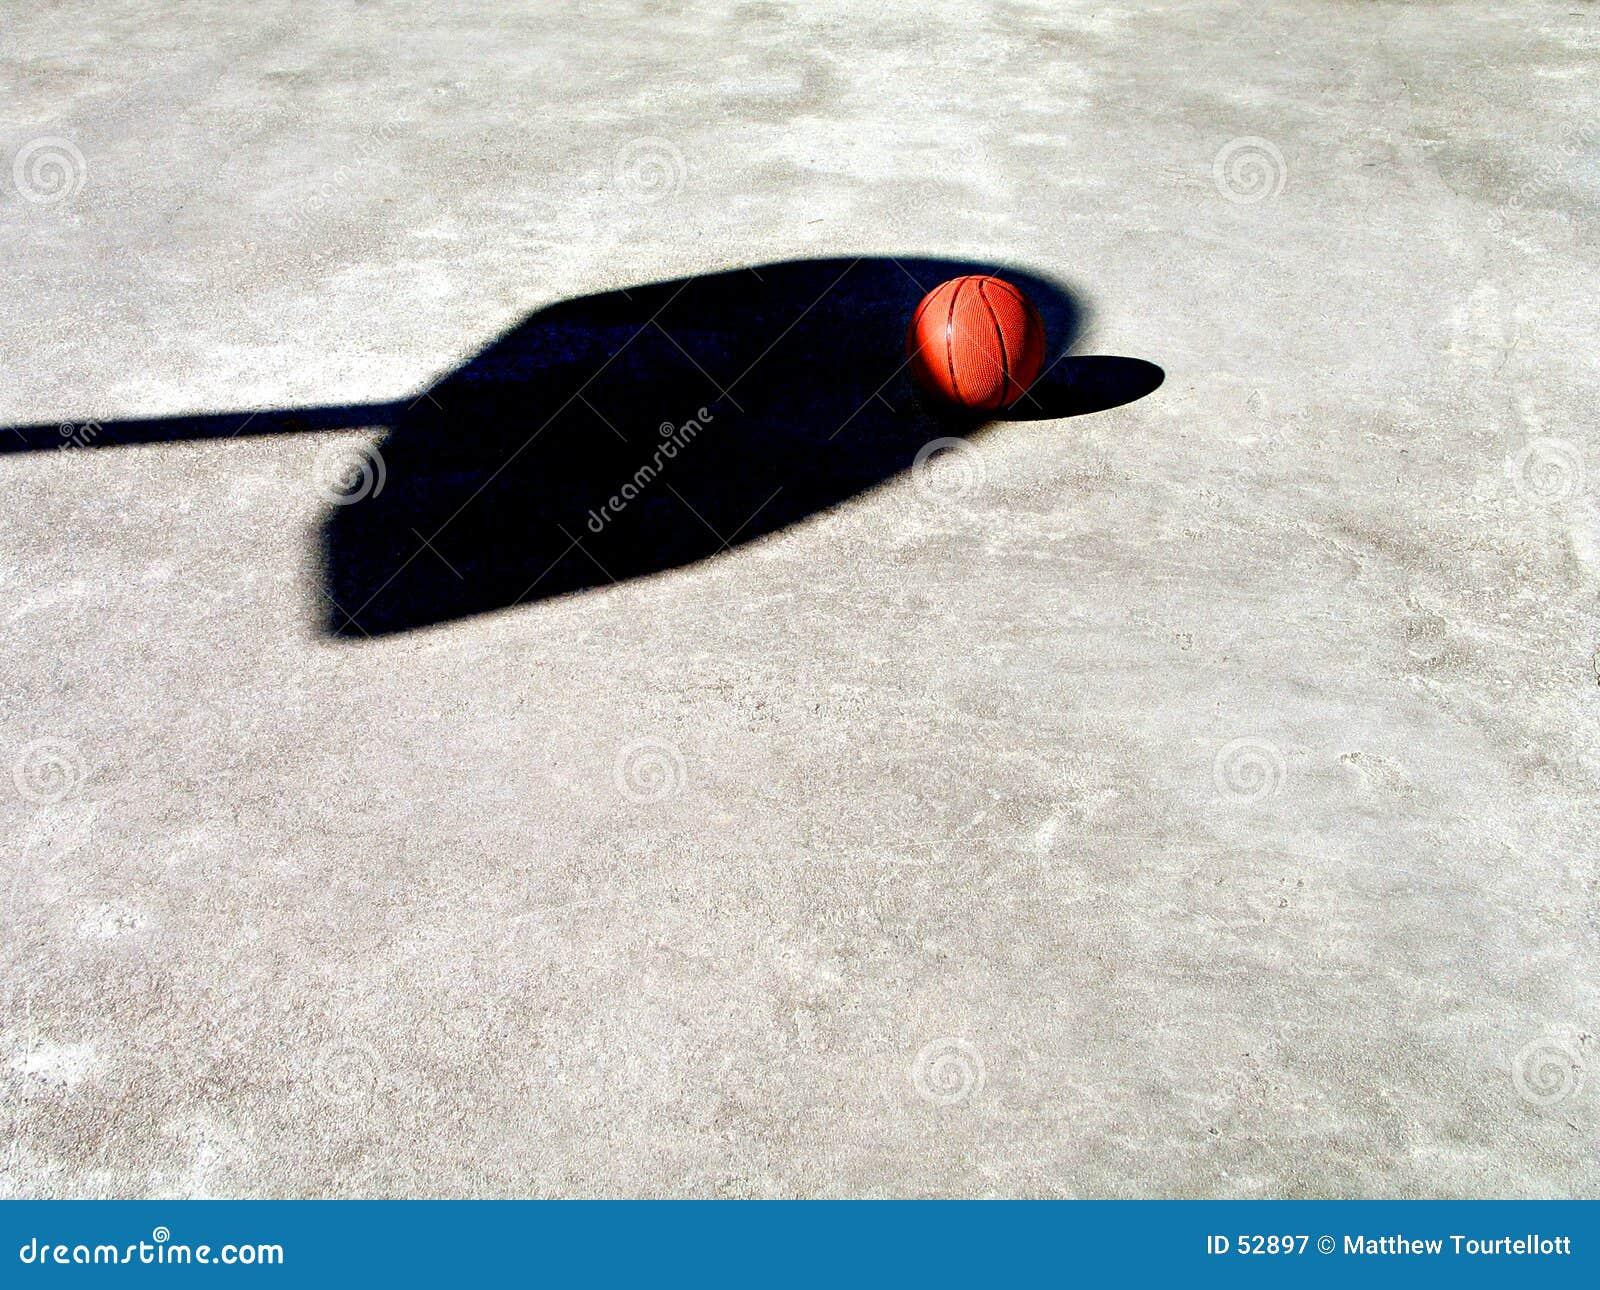 Download καθαρή σκιά καλαθοσφαίρ&io στοκ εικόνα. εικόνα από σκιά - 52897